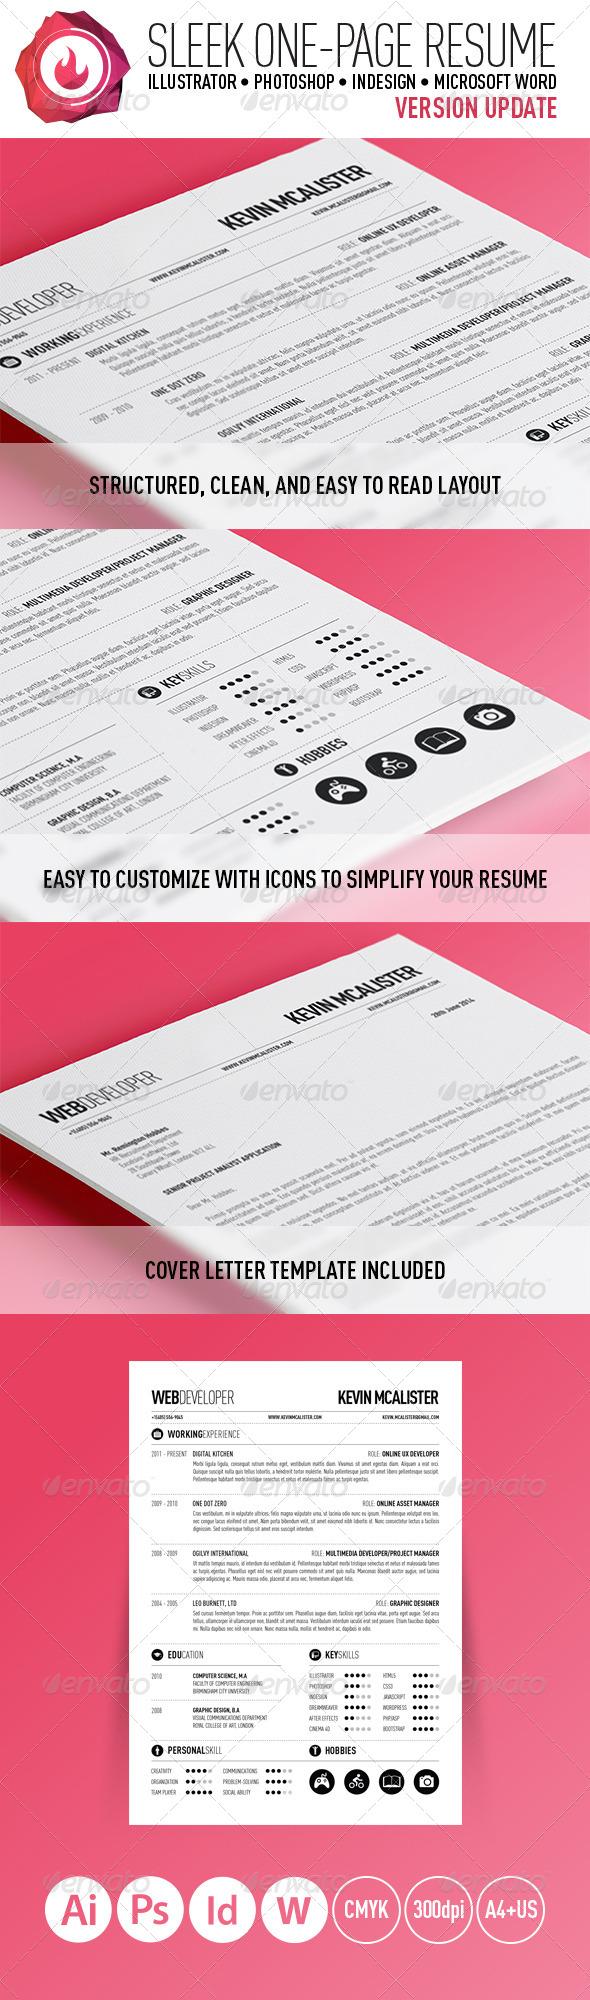 Sleek One-Page Resume